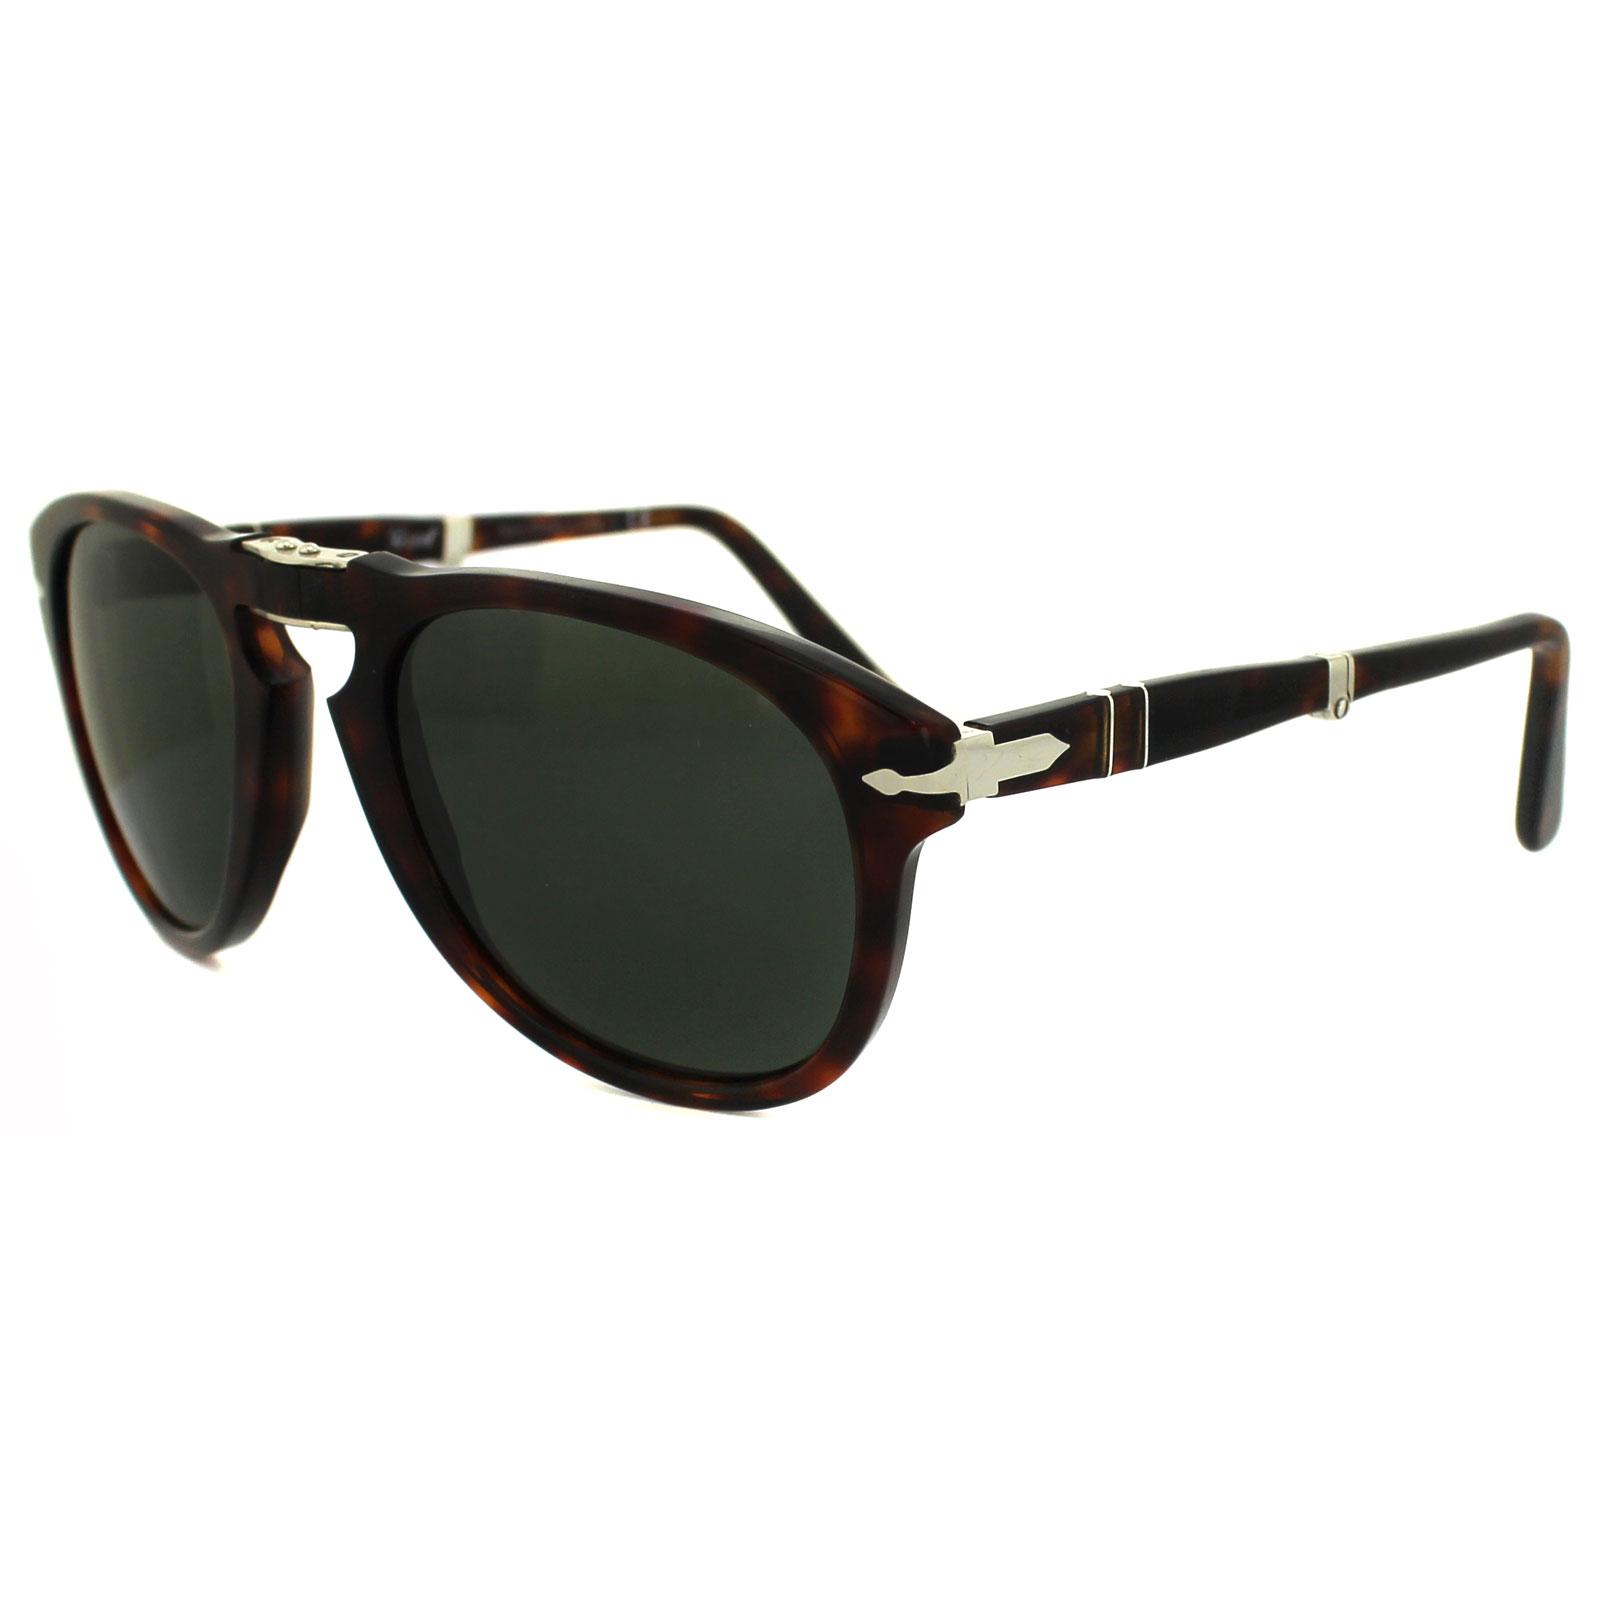 858fbd43b8 Cheap Persol 714 Sunglasses - Discounted Sunglasses